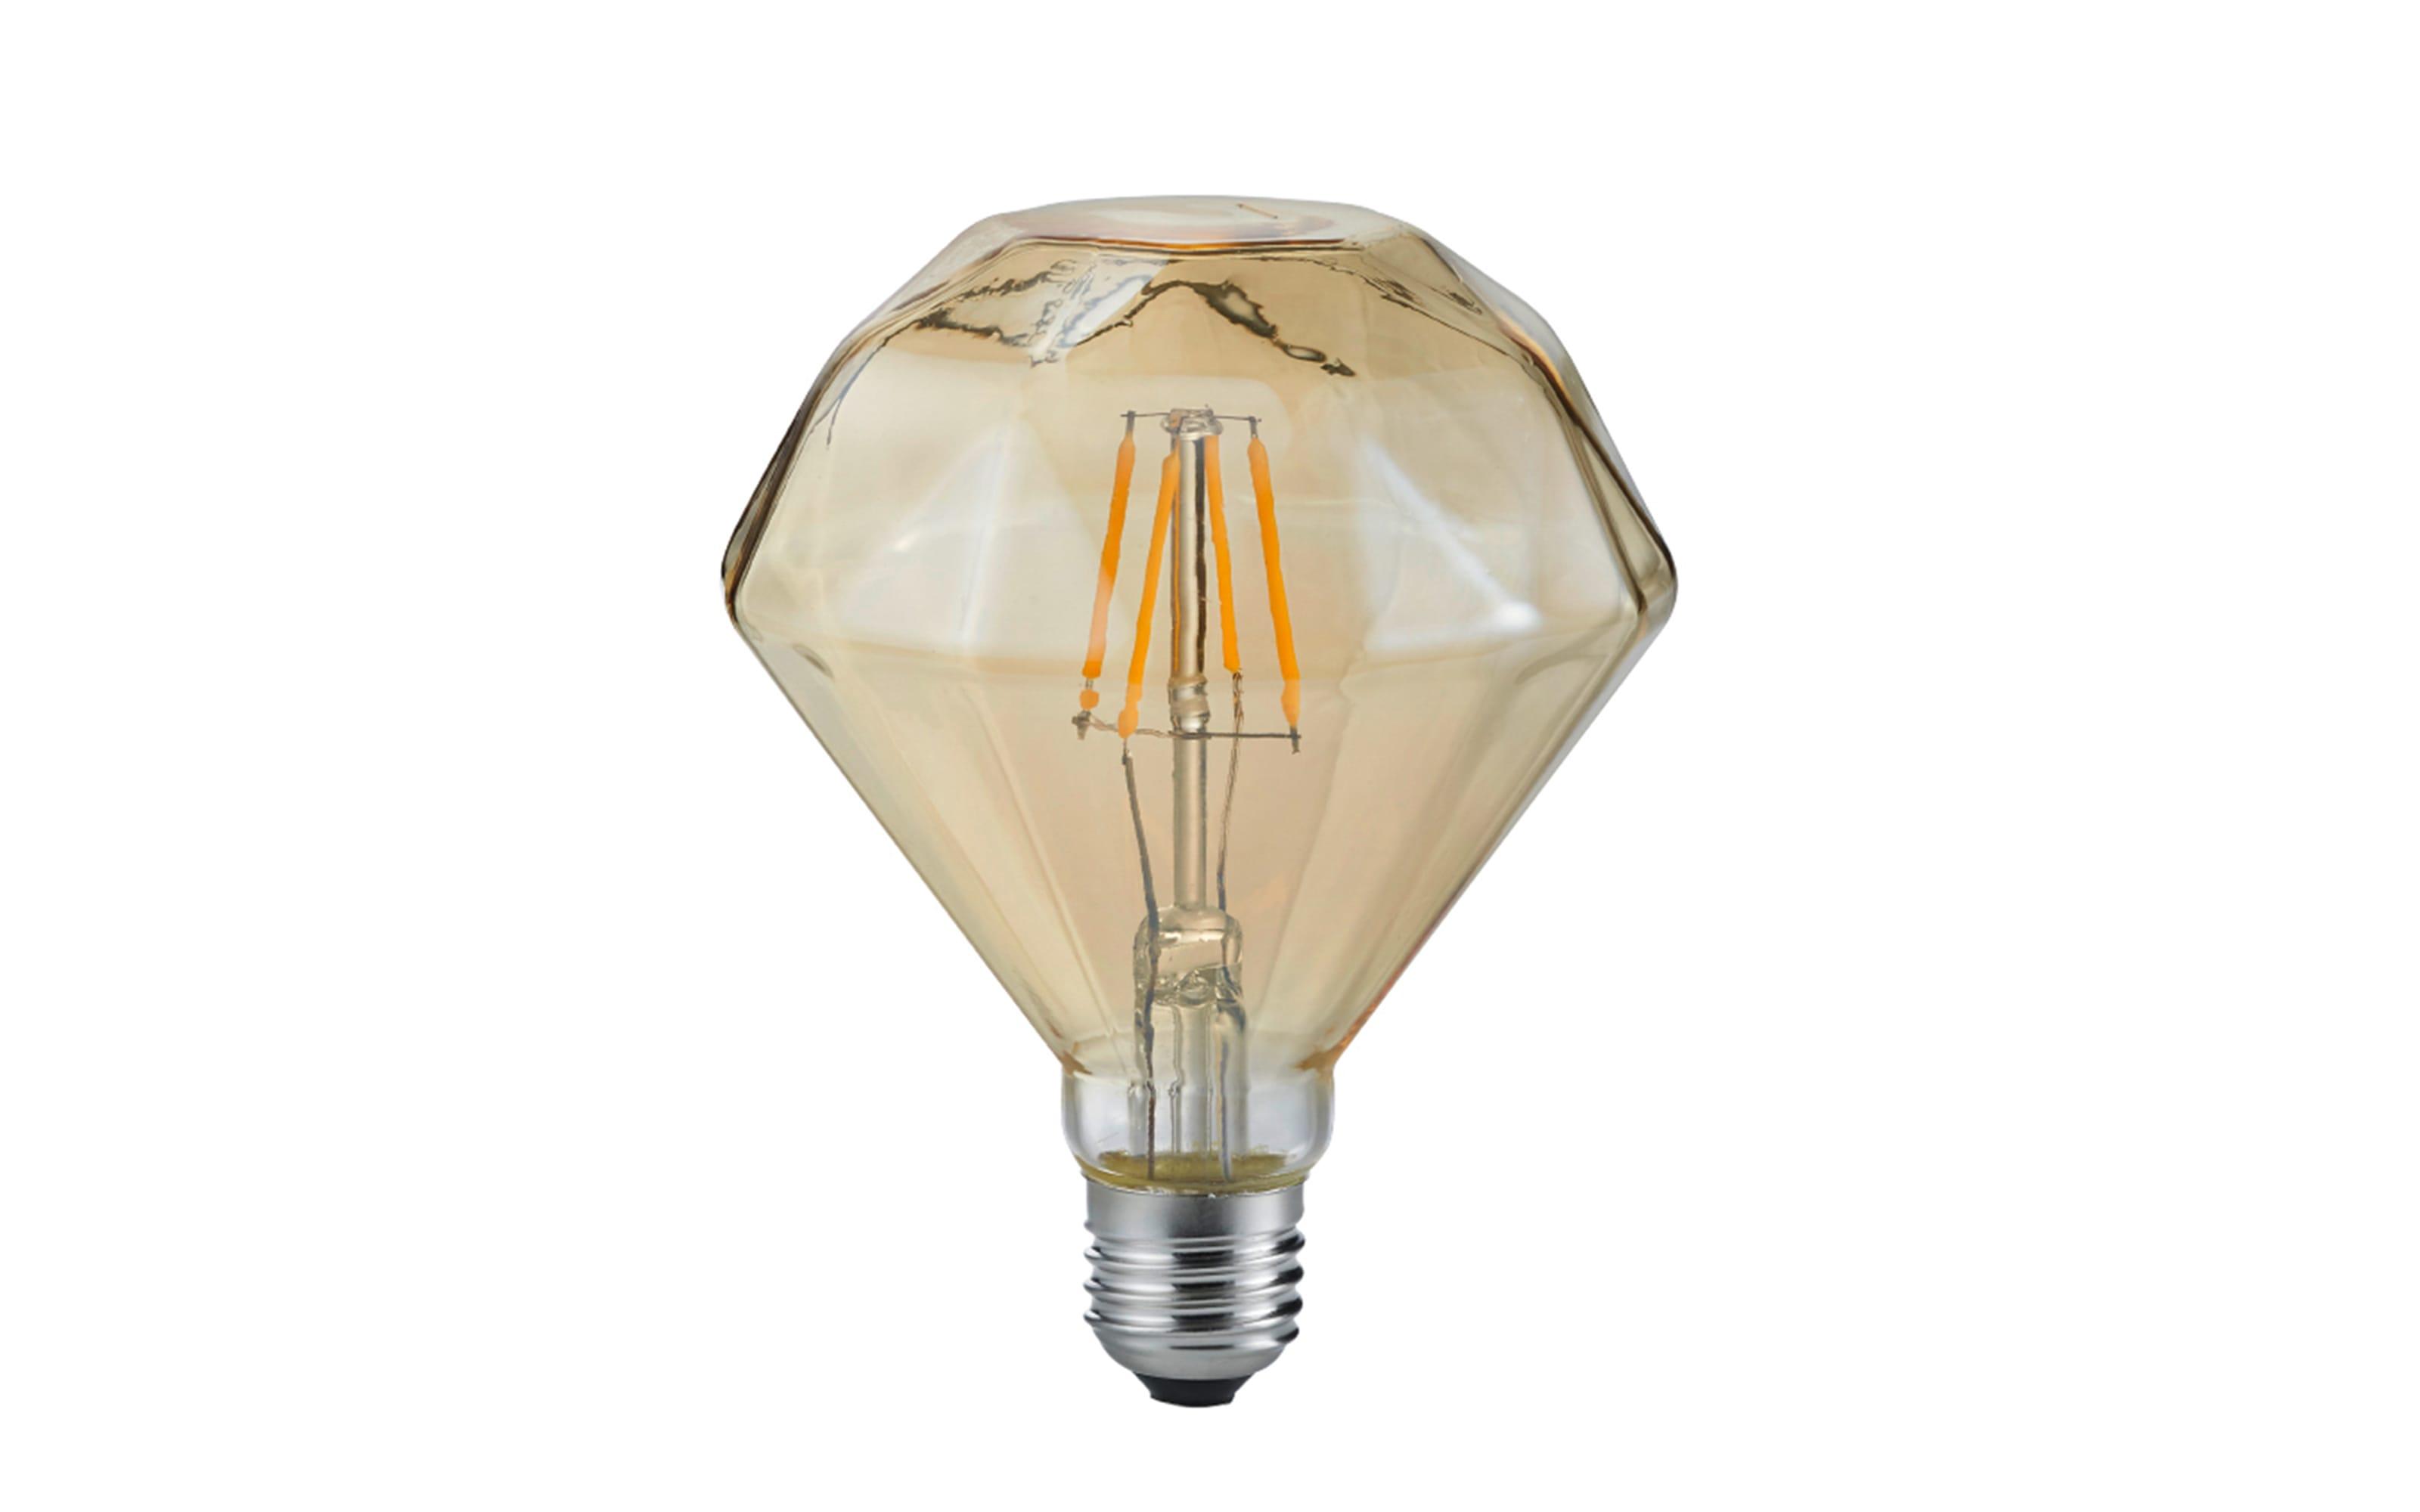 LED-Filament Diamant rund beige getönt, 4 W / E27